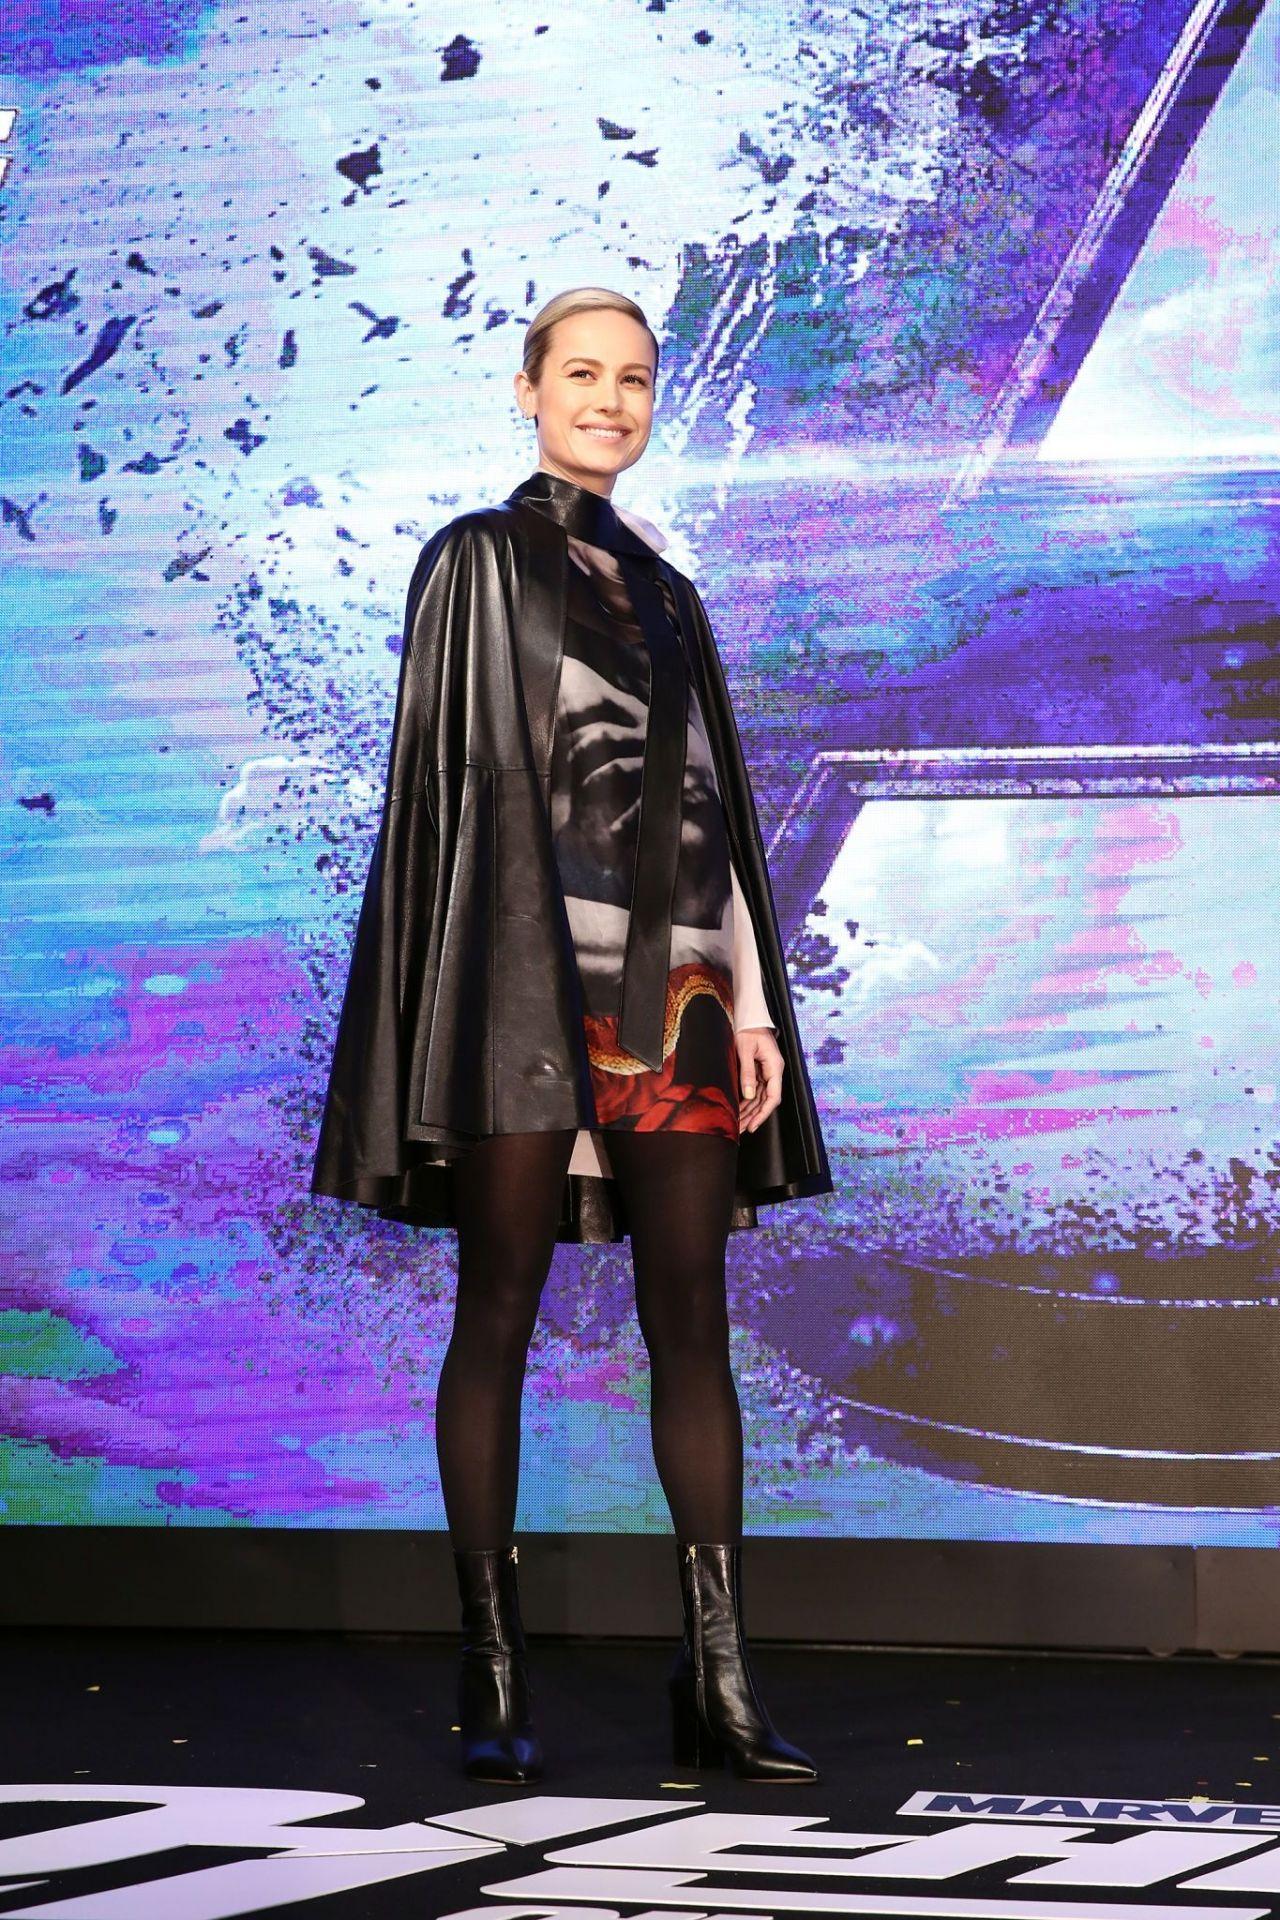 Brie Larson Quot Avengers Endgame Quot Press Conference In